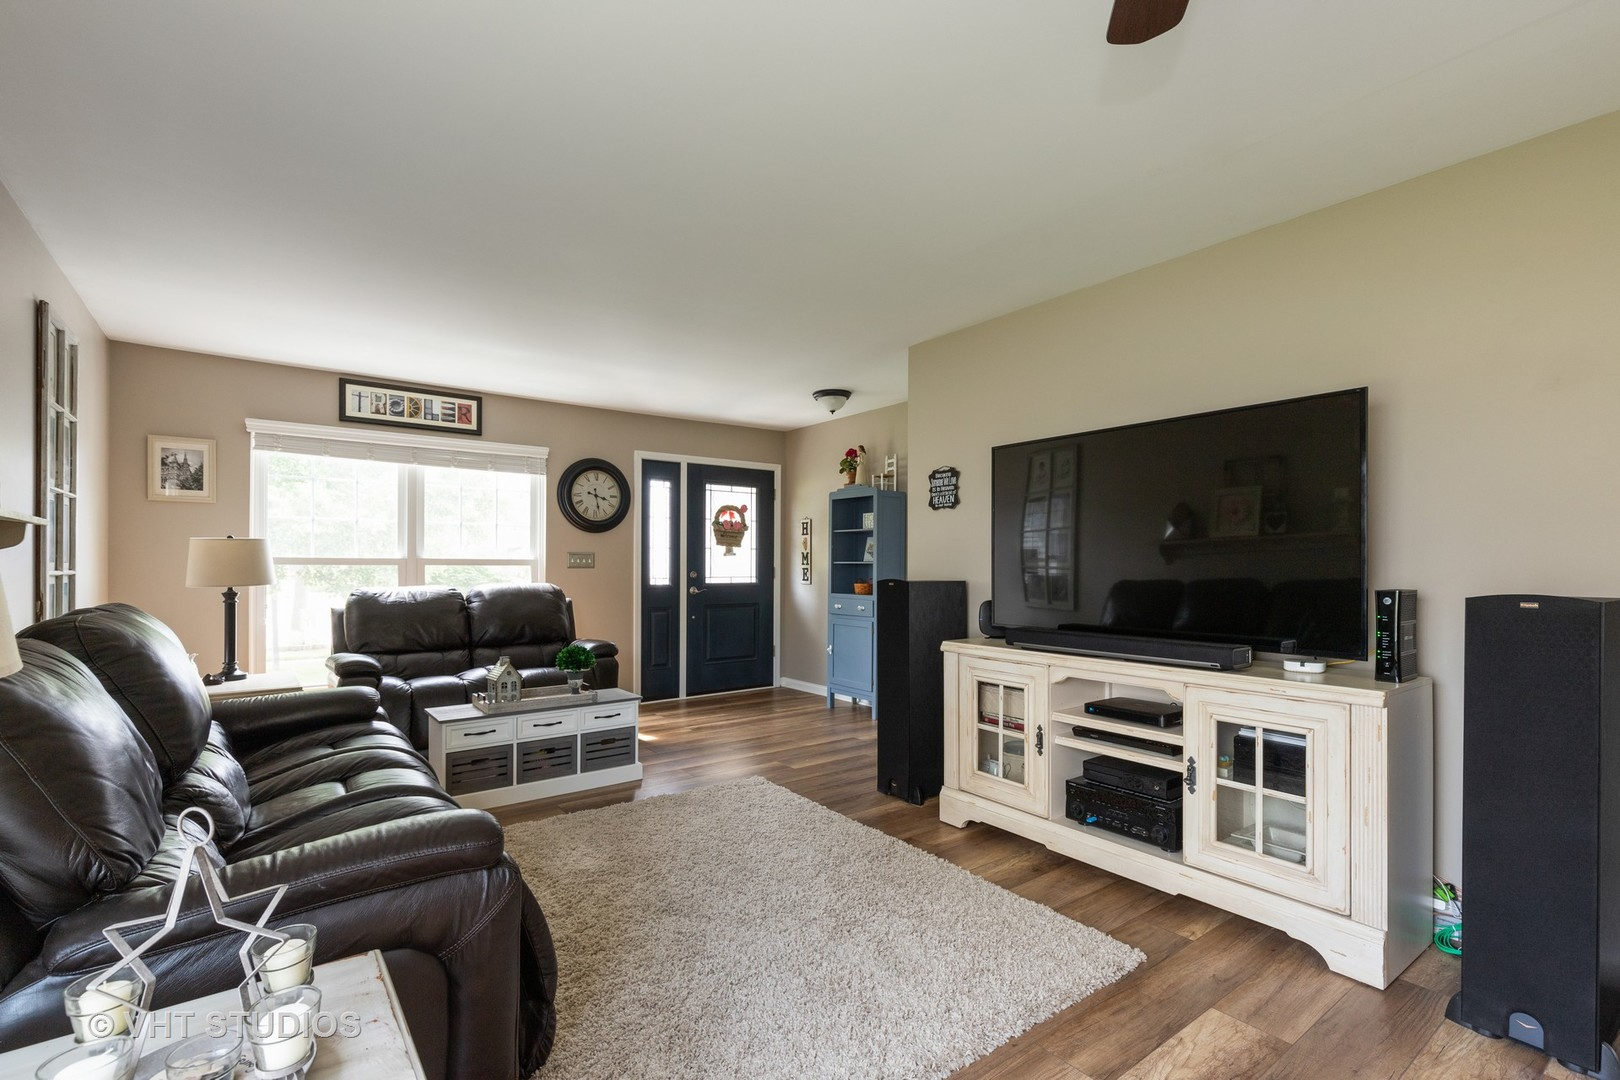 2255 Woodoak, ROUND LAKE BEACH, Illinois, 60073